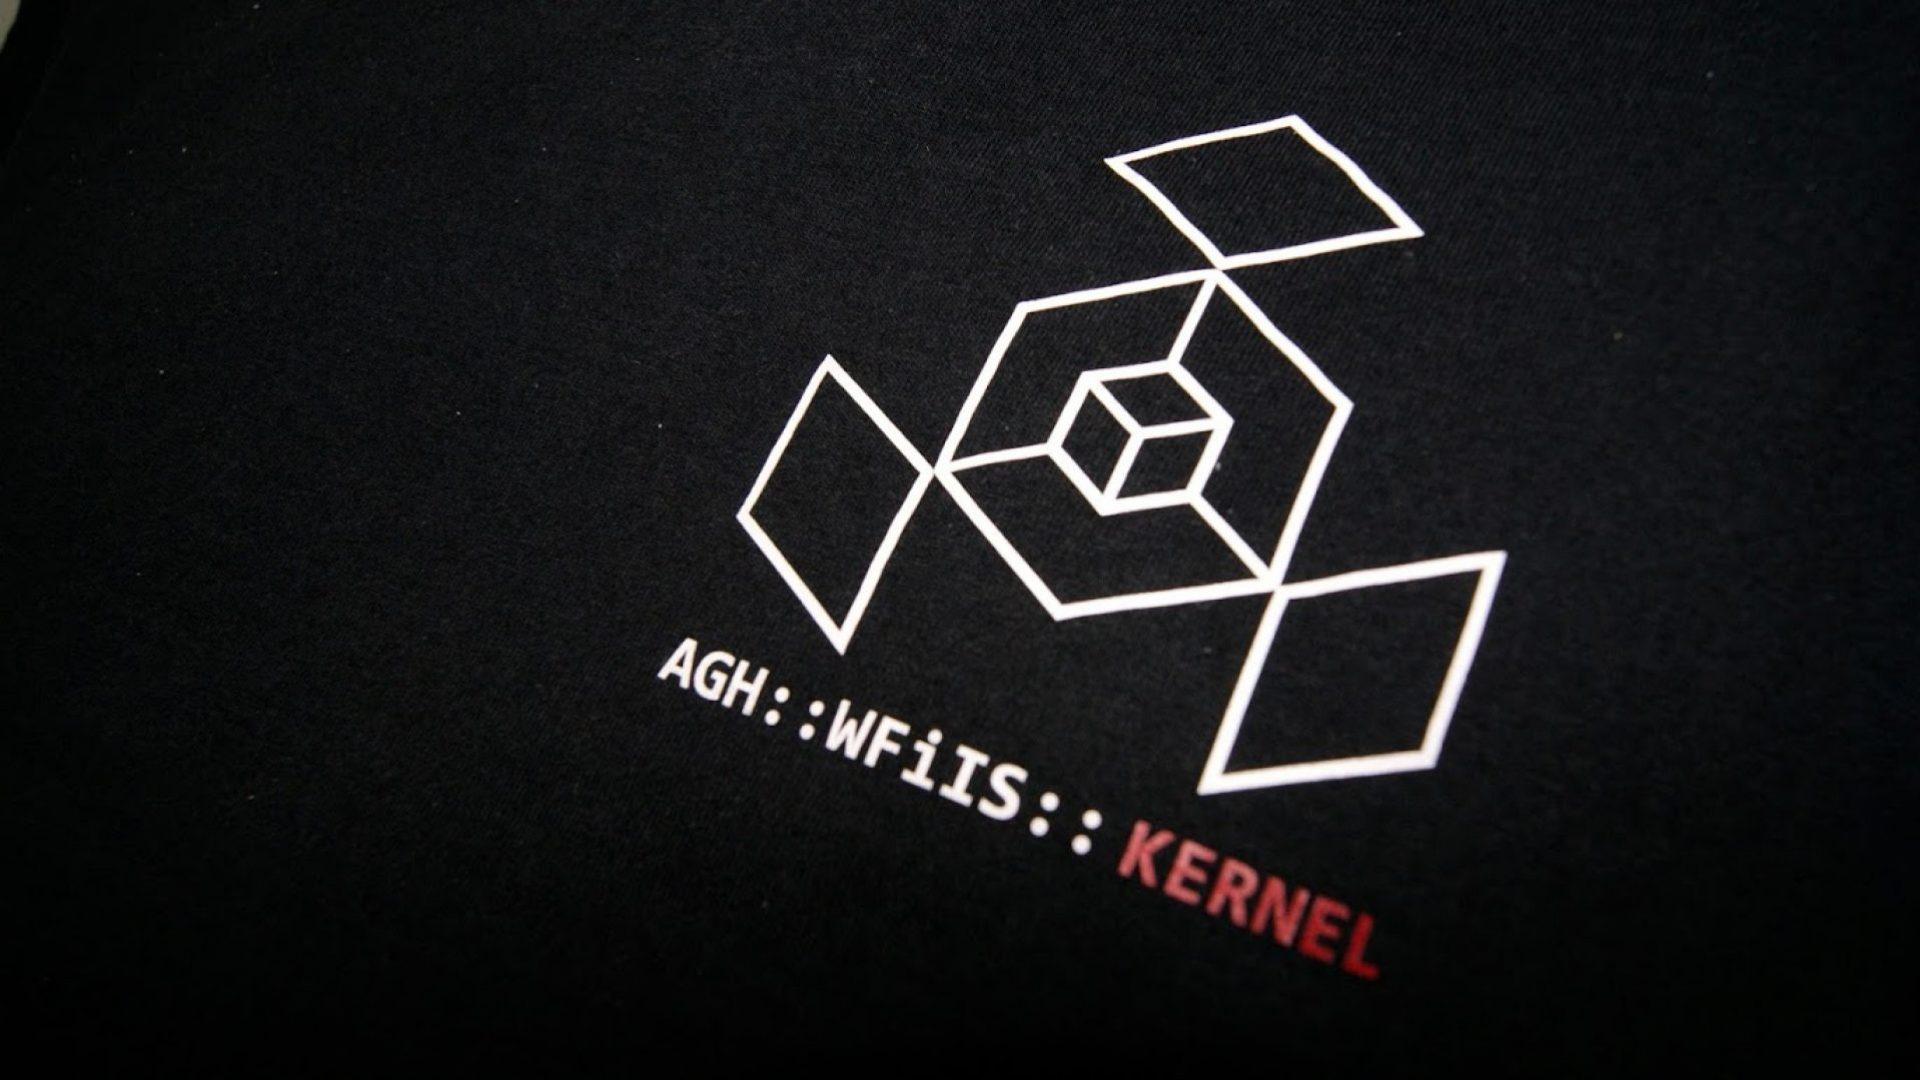 KNI Kernel